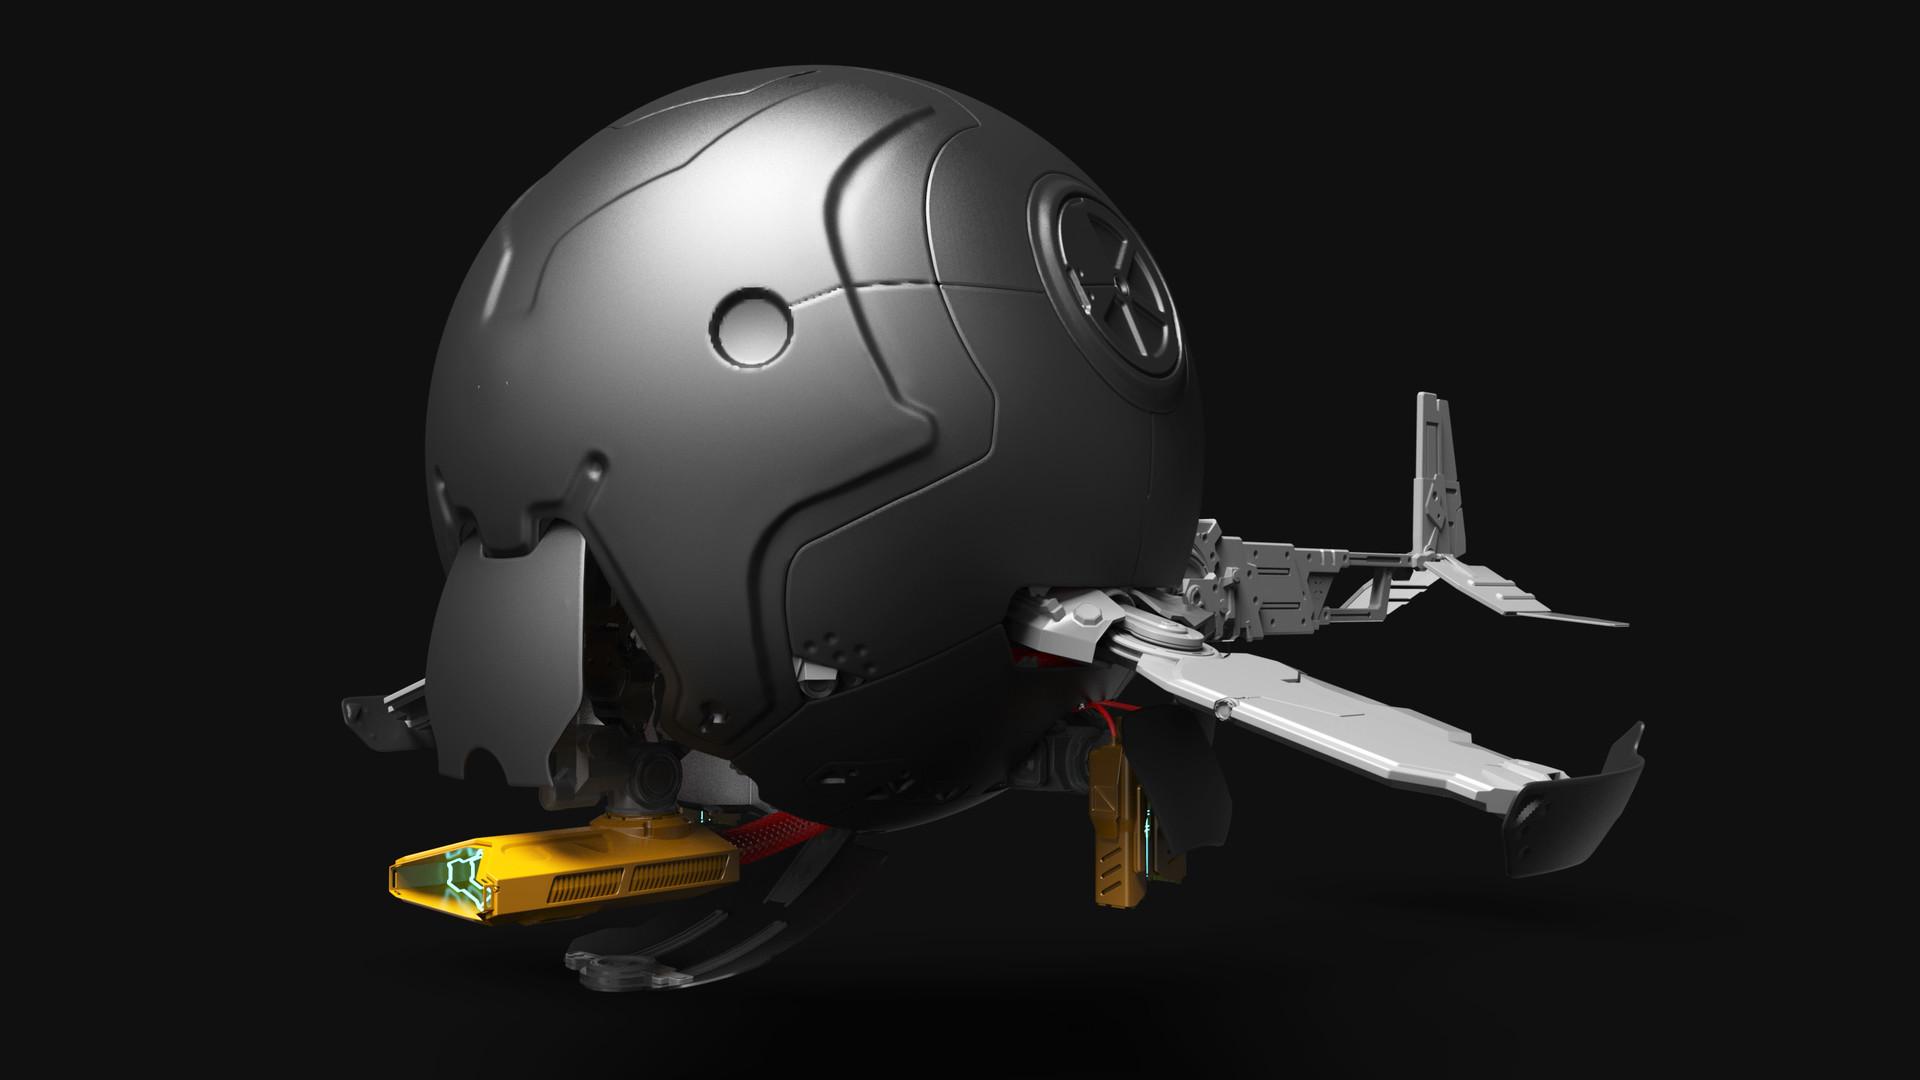 Vojtech lacina drone1